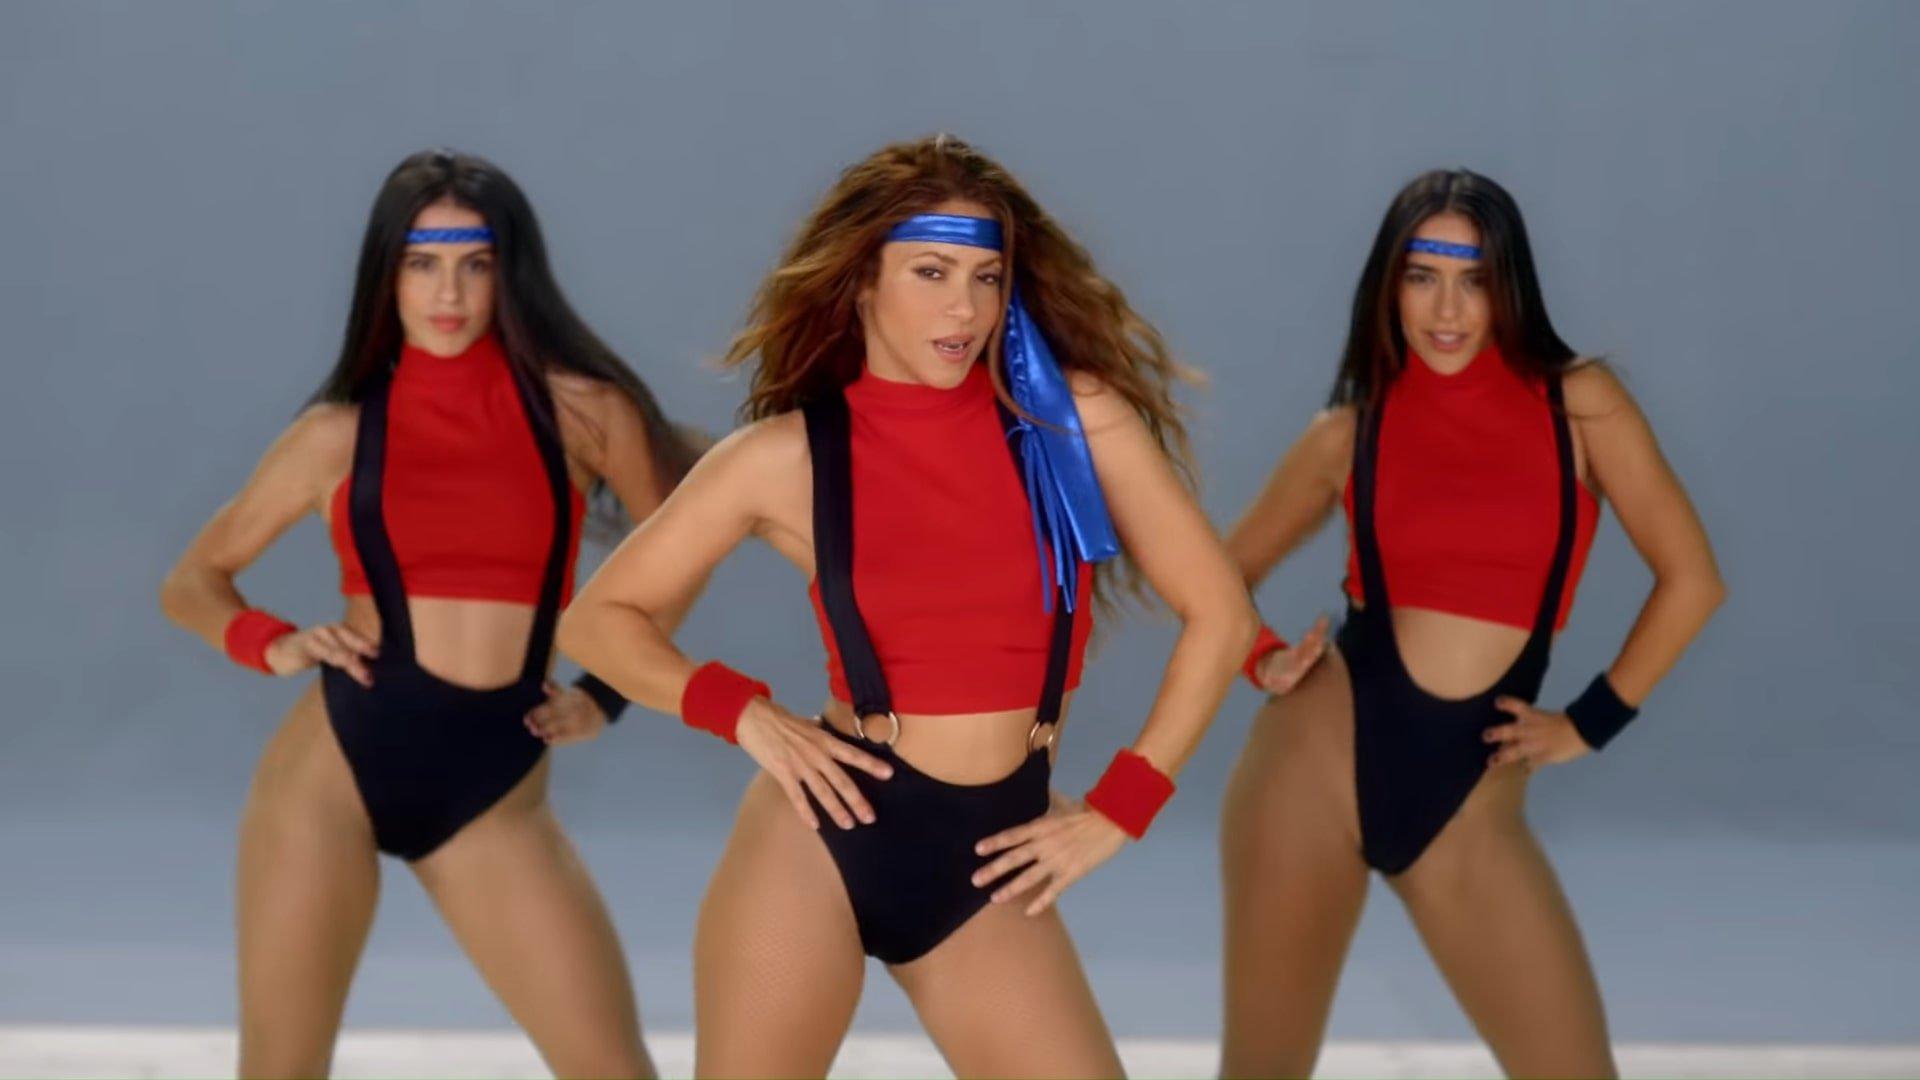 Black Eyed Peas, Shakira - GIRL LIKE ME (Official Music Video) 2-47 Screenshot